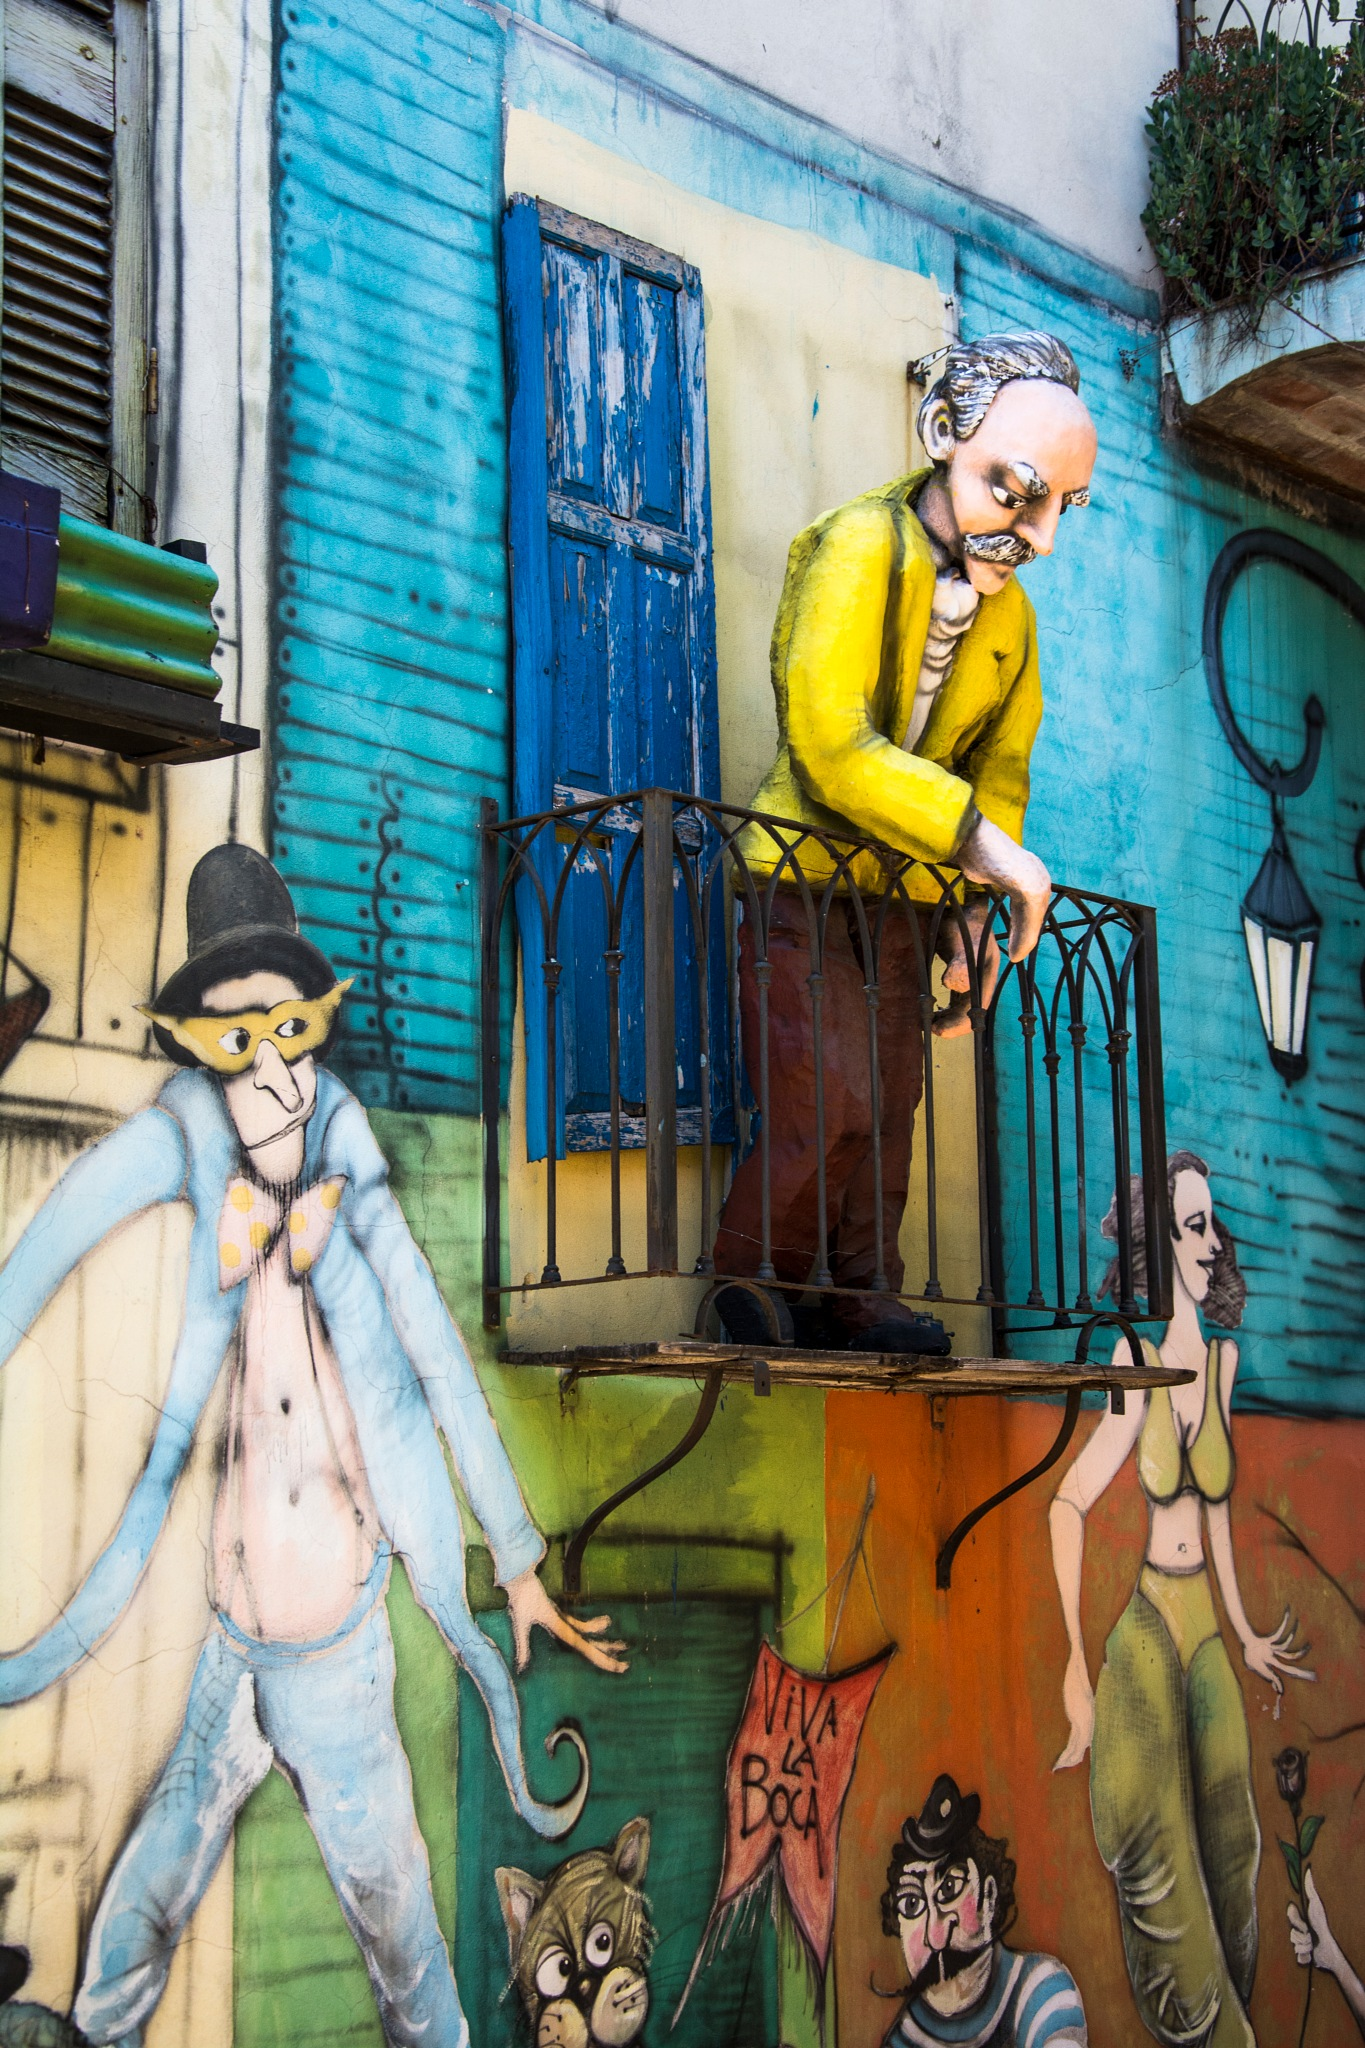 Caminito 9, Buenos Aires  by nilsons1974